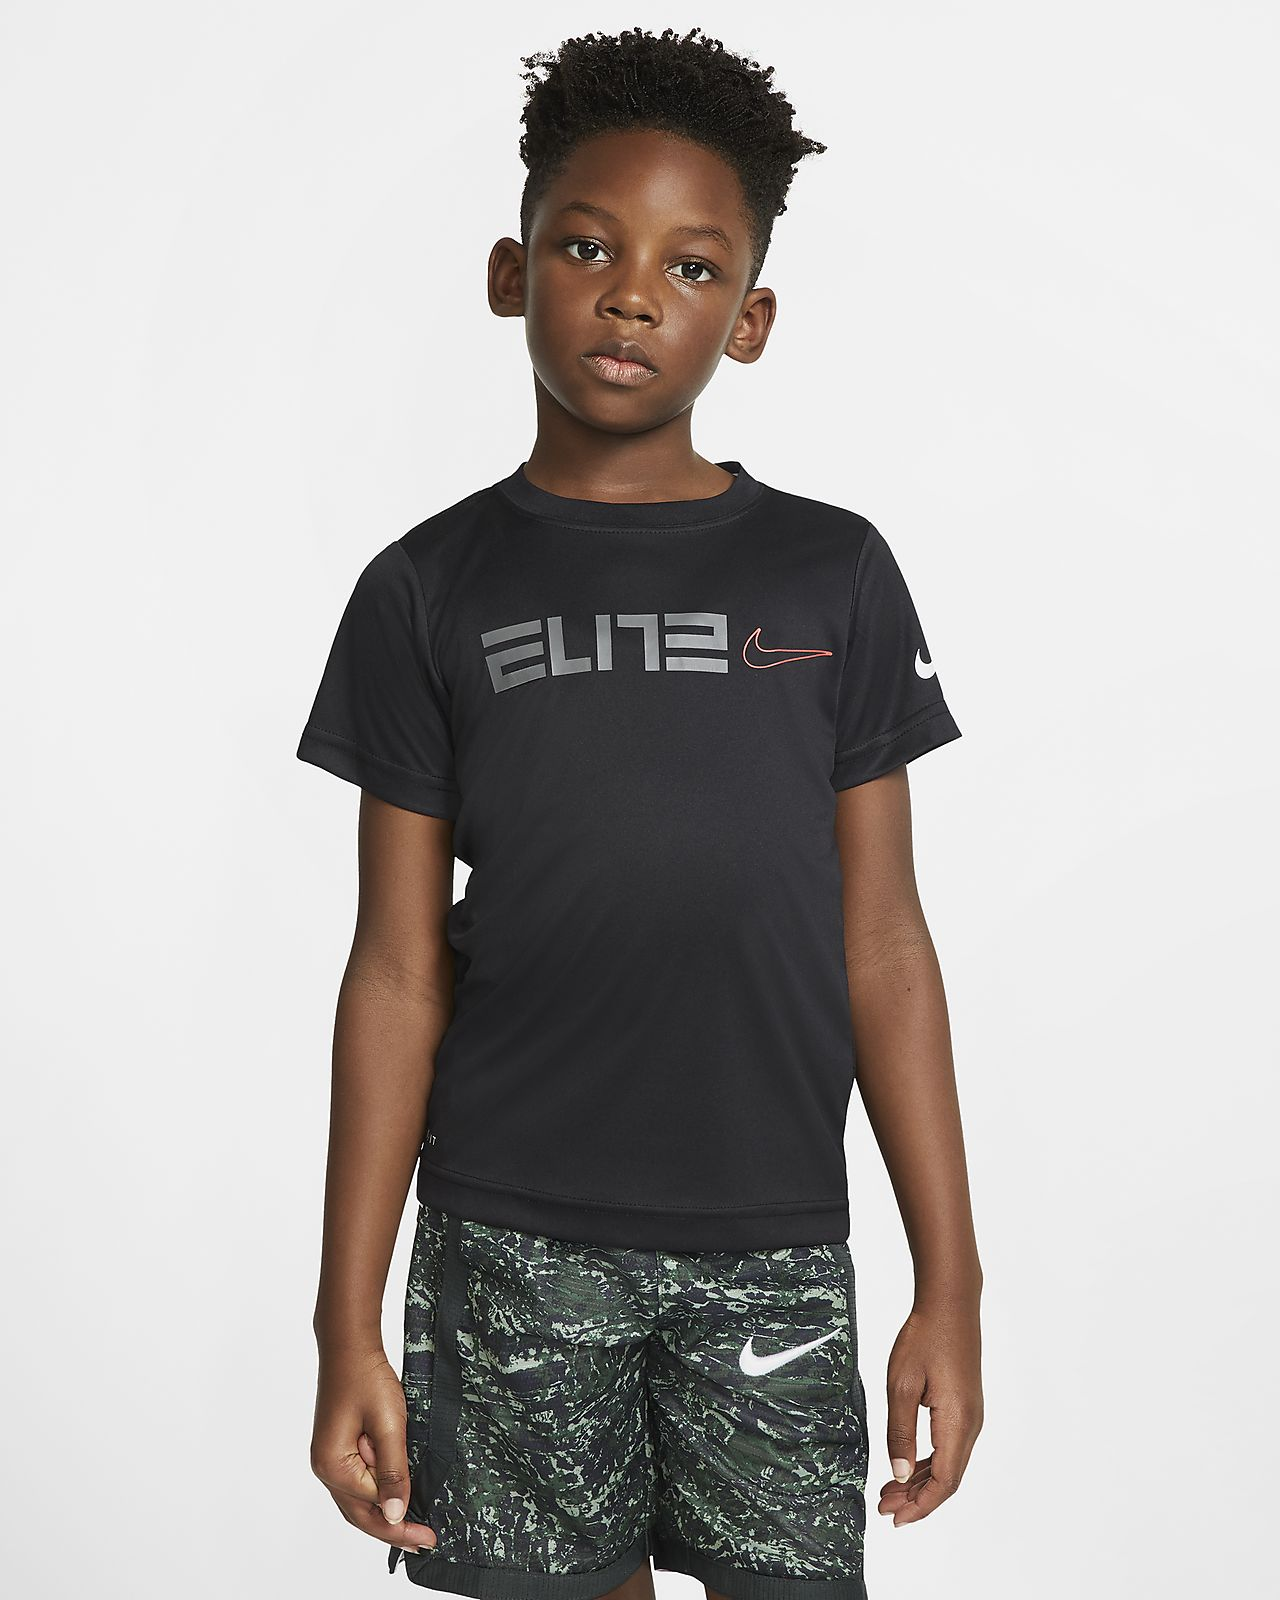 Playera de manga corta para niños talla pequeña Nike Dri-FIT Elite